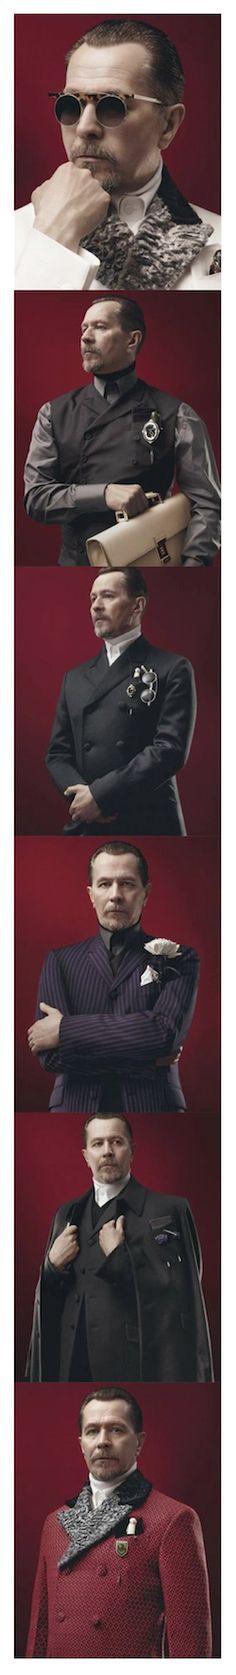 Gary Oldman for Prada, 2012.